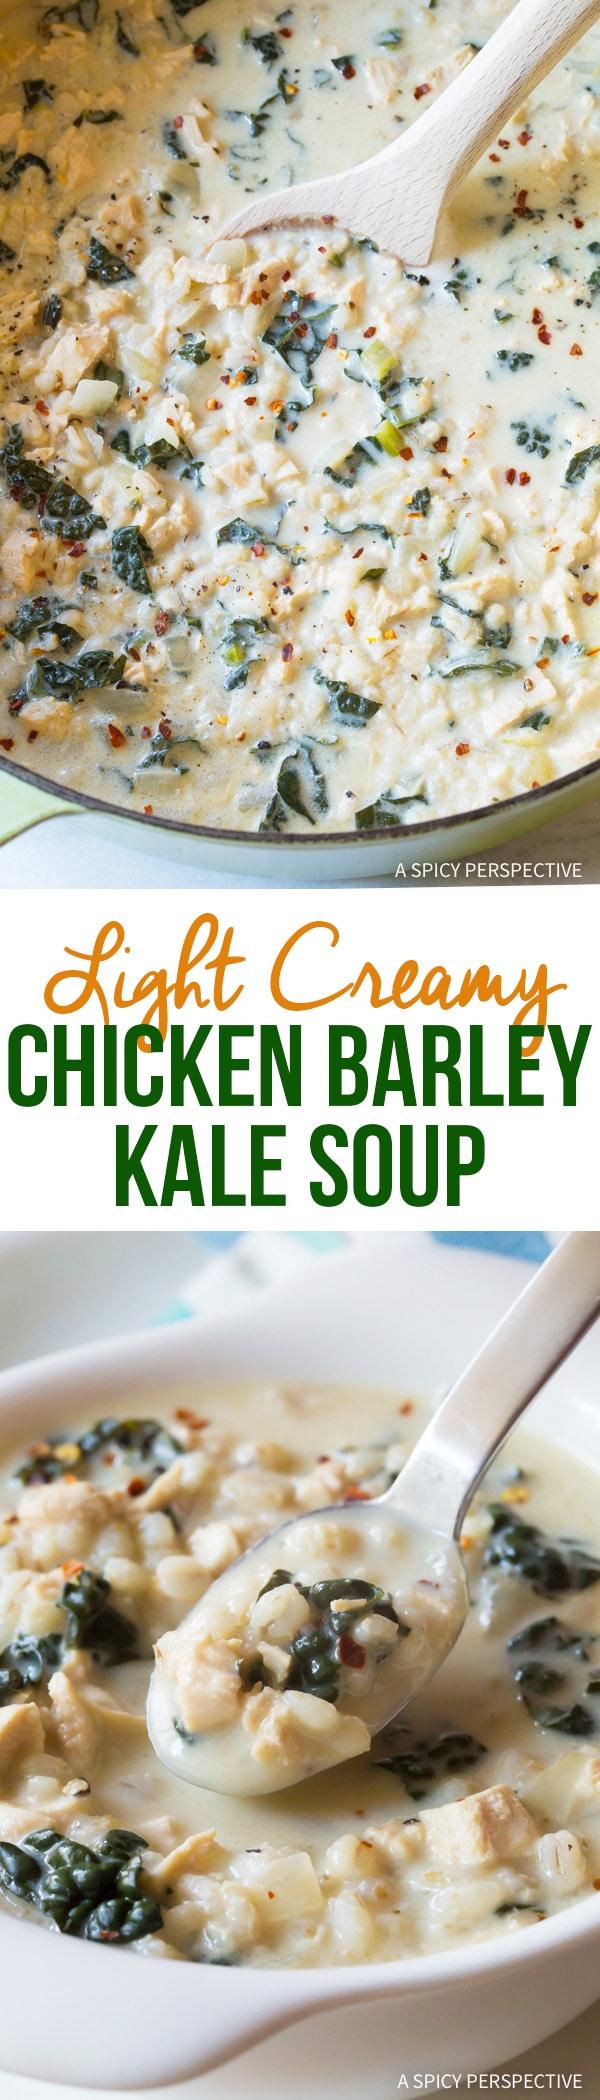 Amazing! Light Creamy Chicken Barley Kale Soup